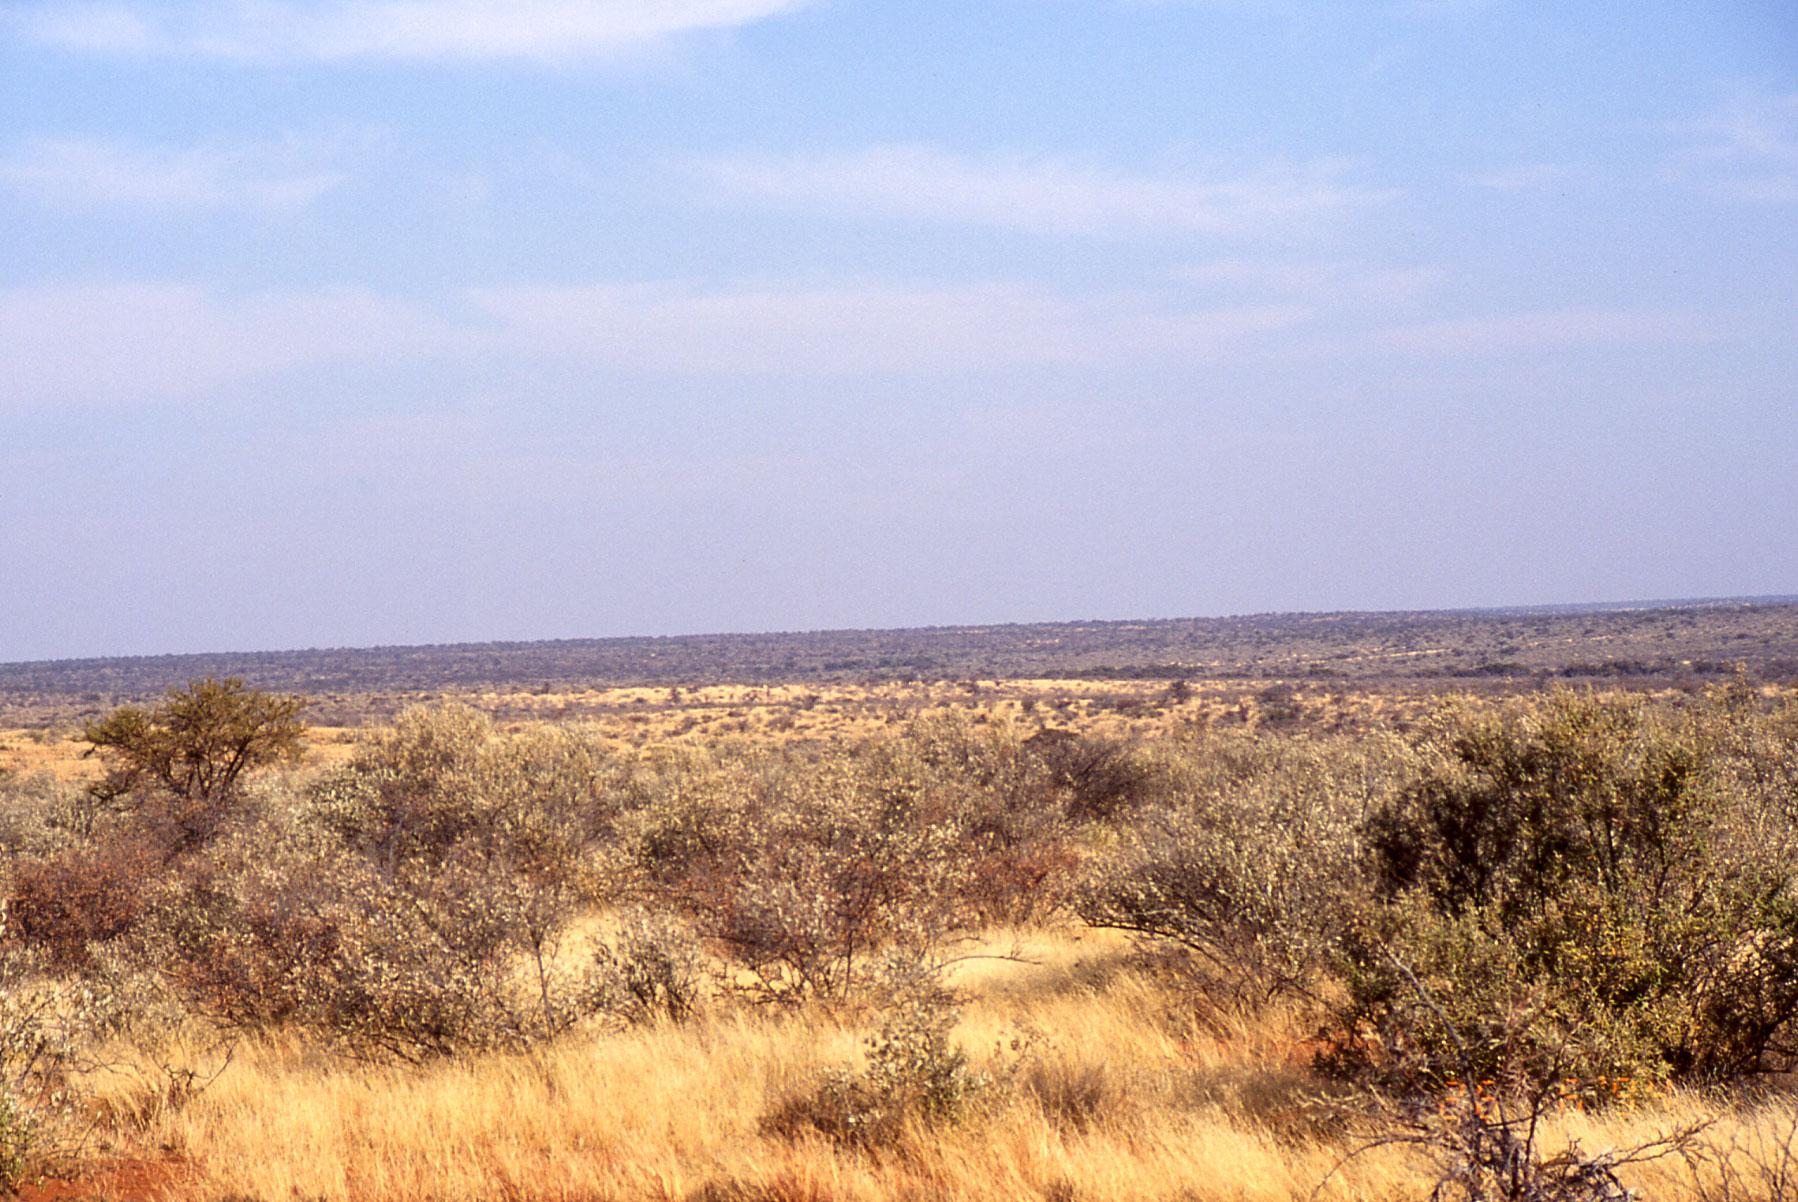 File:African.landscape.jpg - Wikimedia Commons